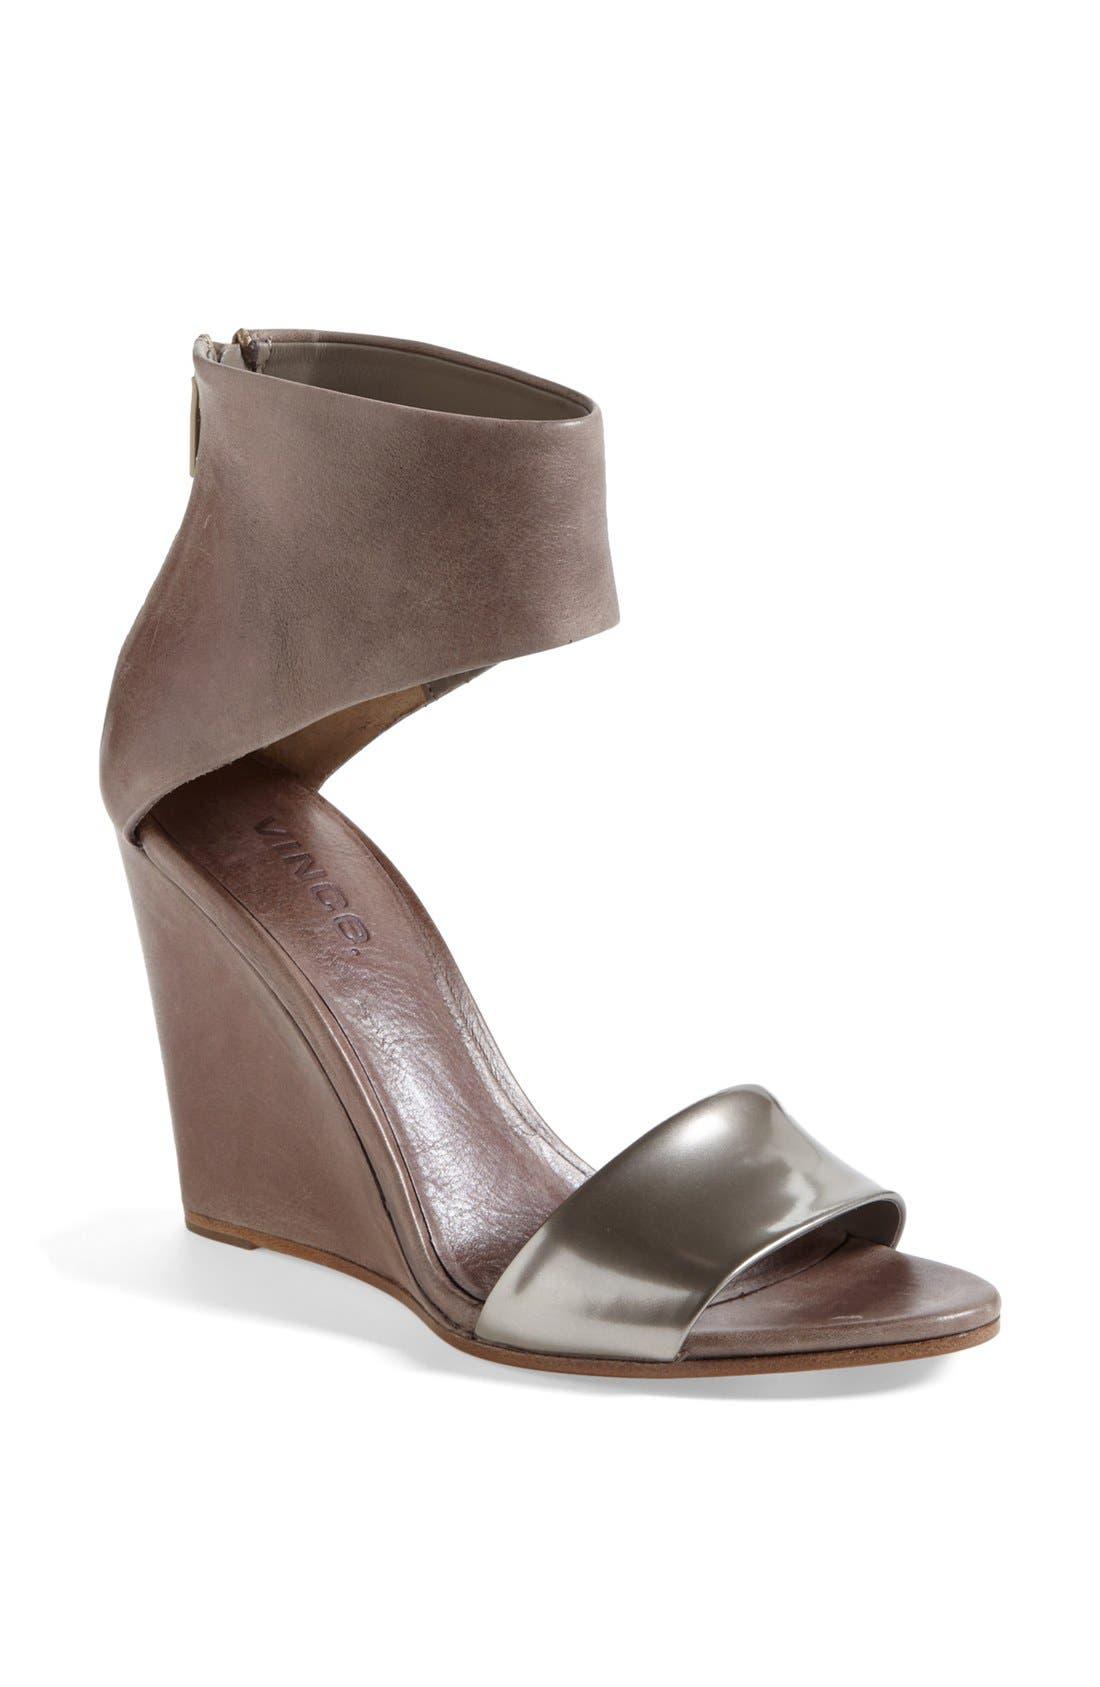 Alternate Image 1 Selected - Vince 'Kelan' Sandal